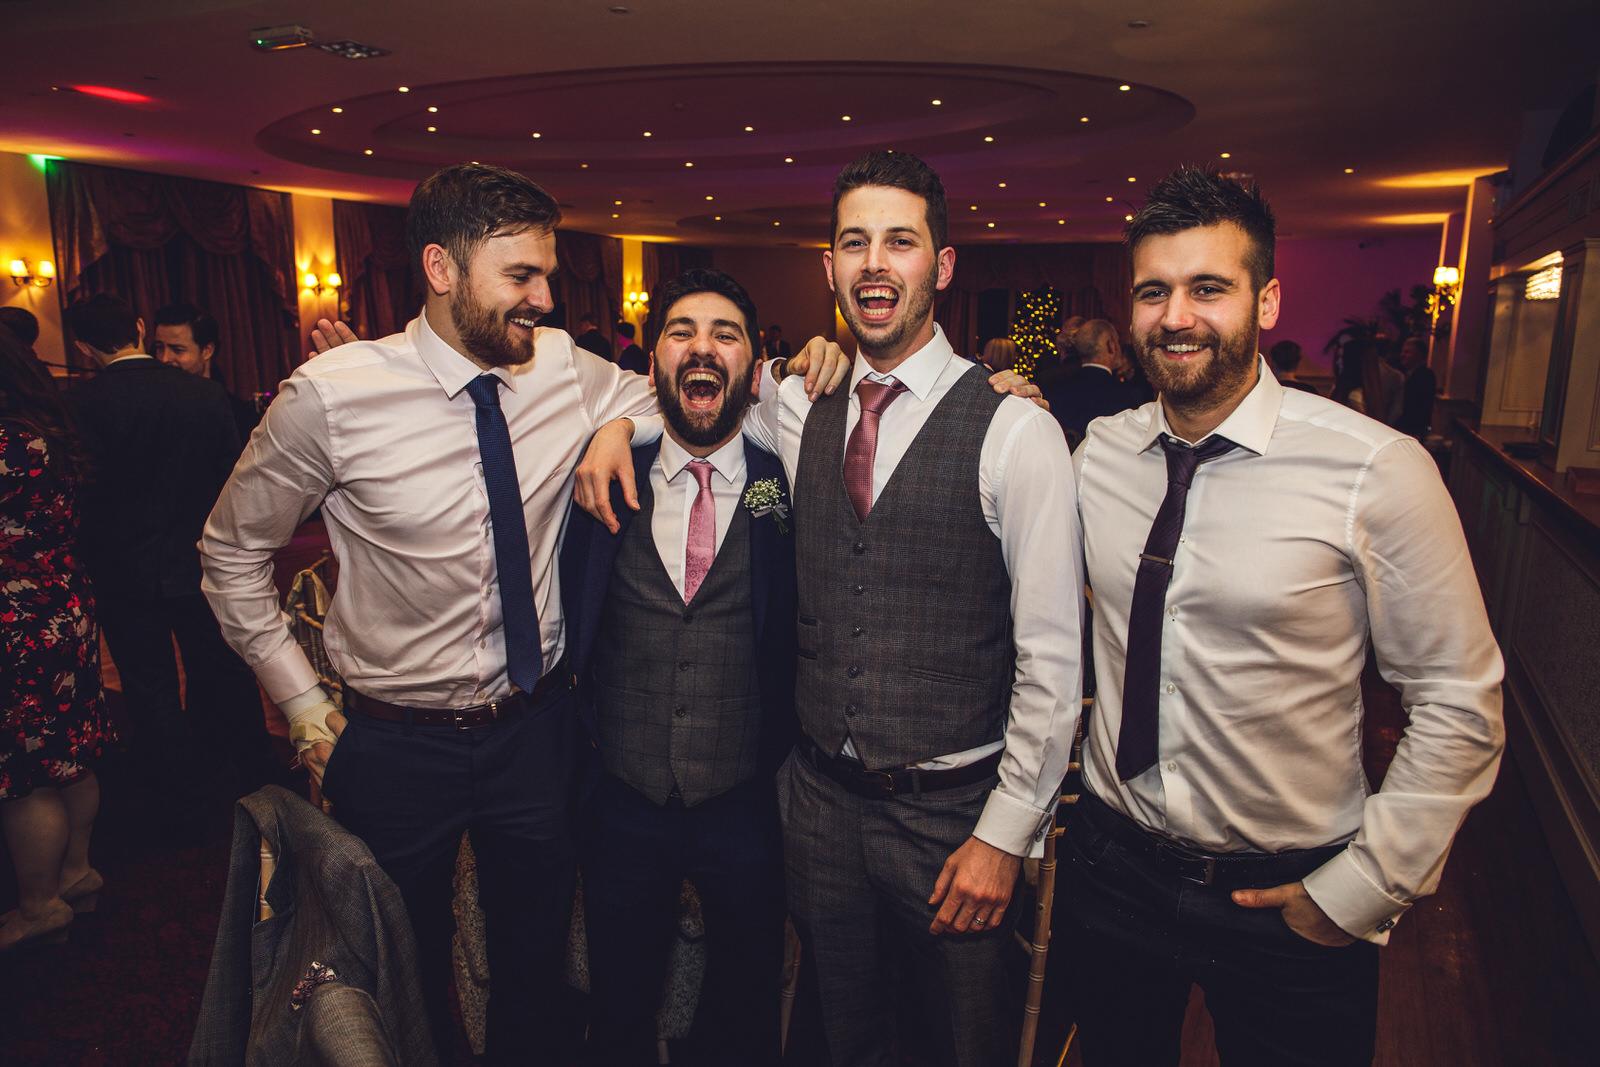 Roger-kenny-wedding-photographer-greystones-wicklow-dublin_122.jpg